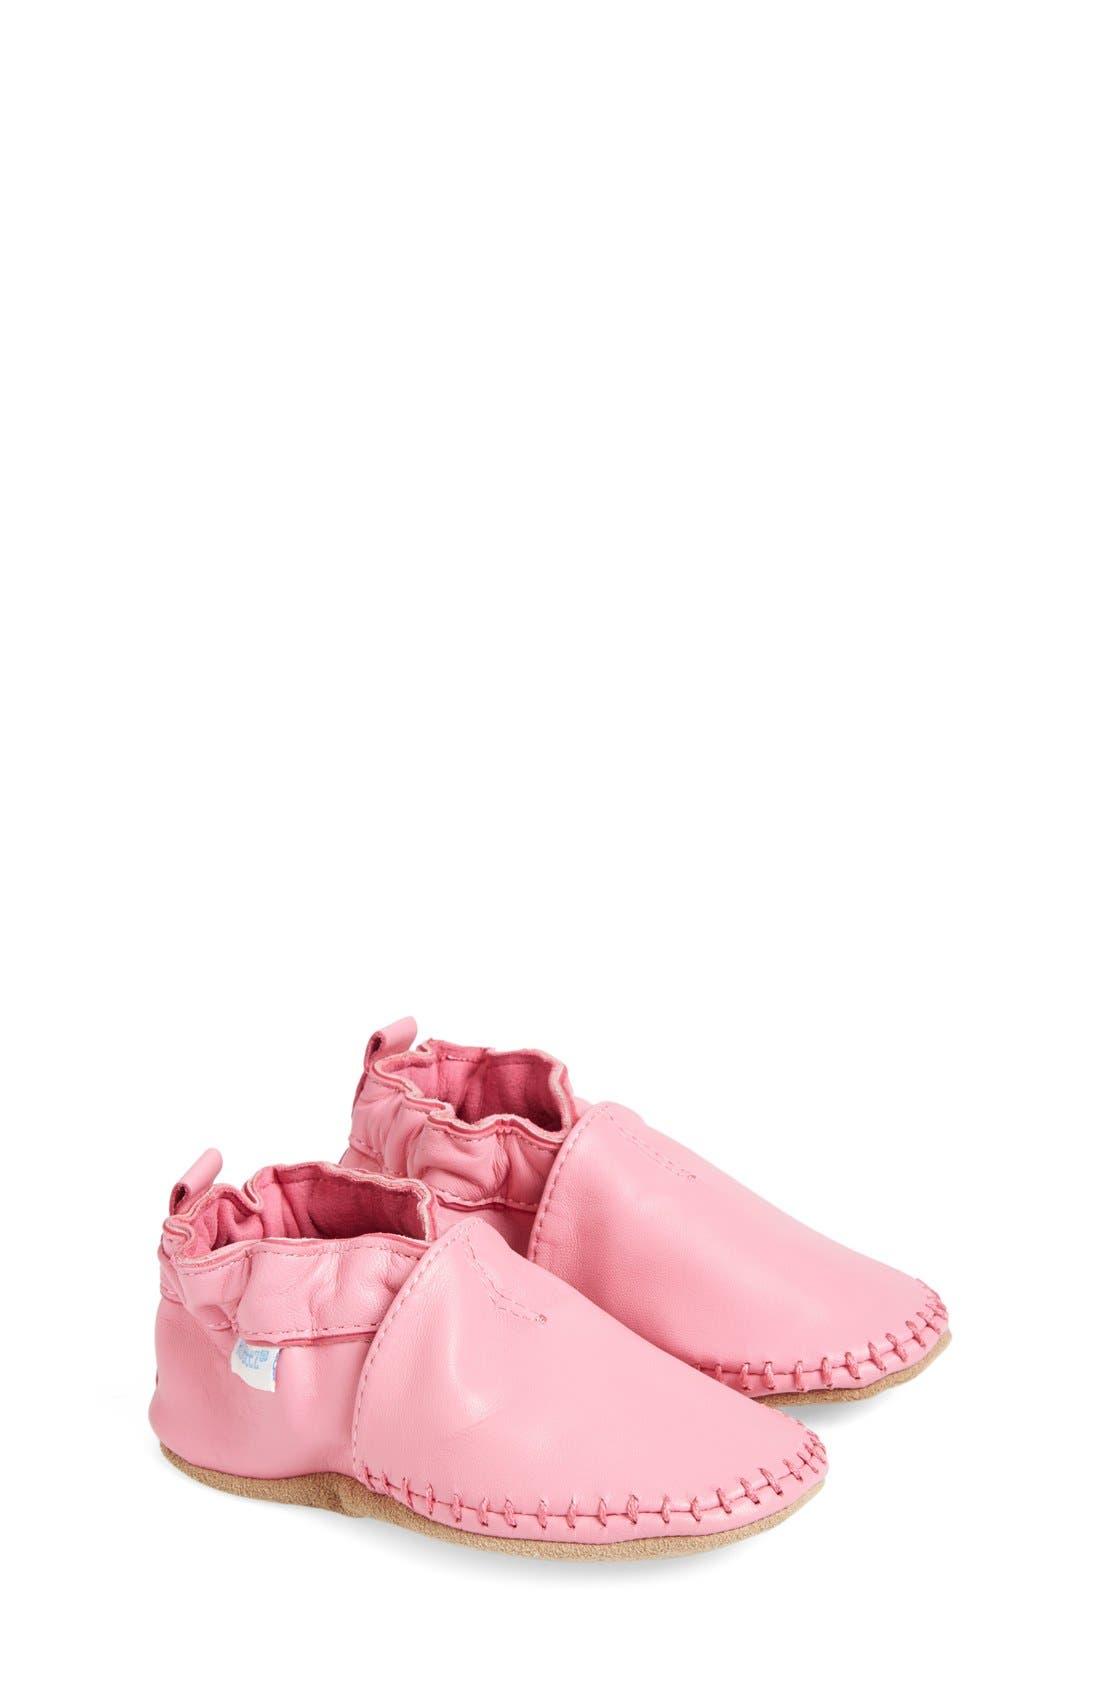 Robeez Classic Moccasin Crib Shoe Baby & Walker